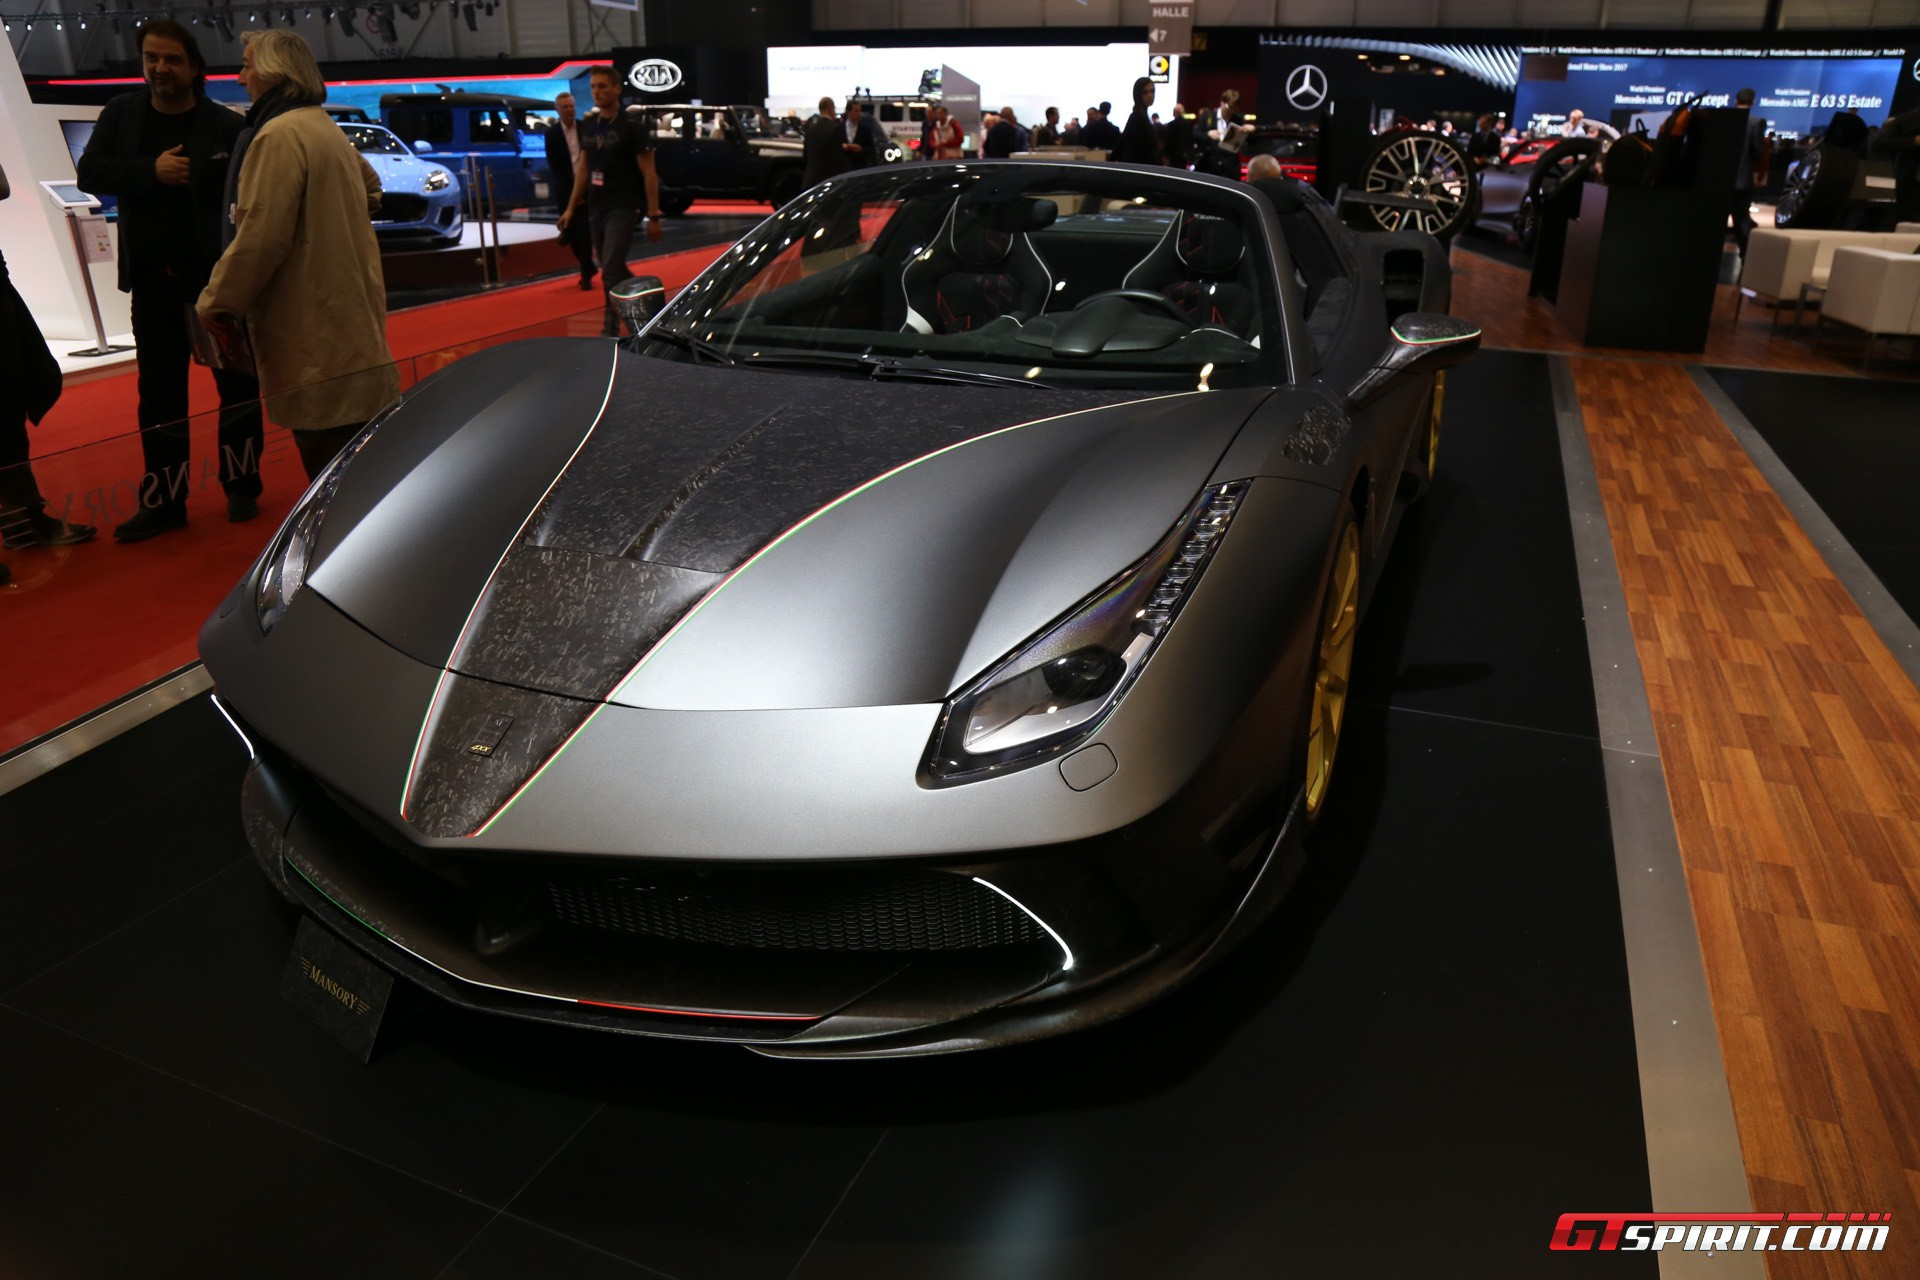 Mansory Ferrari at Geneva 201712